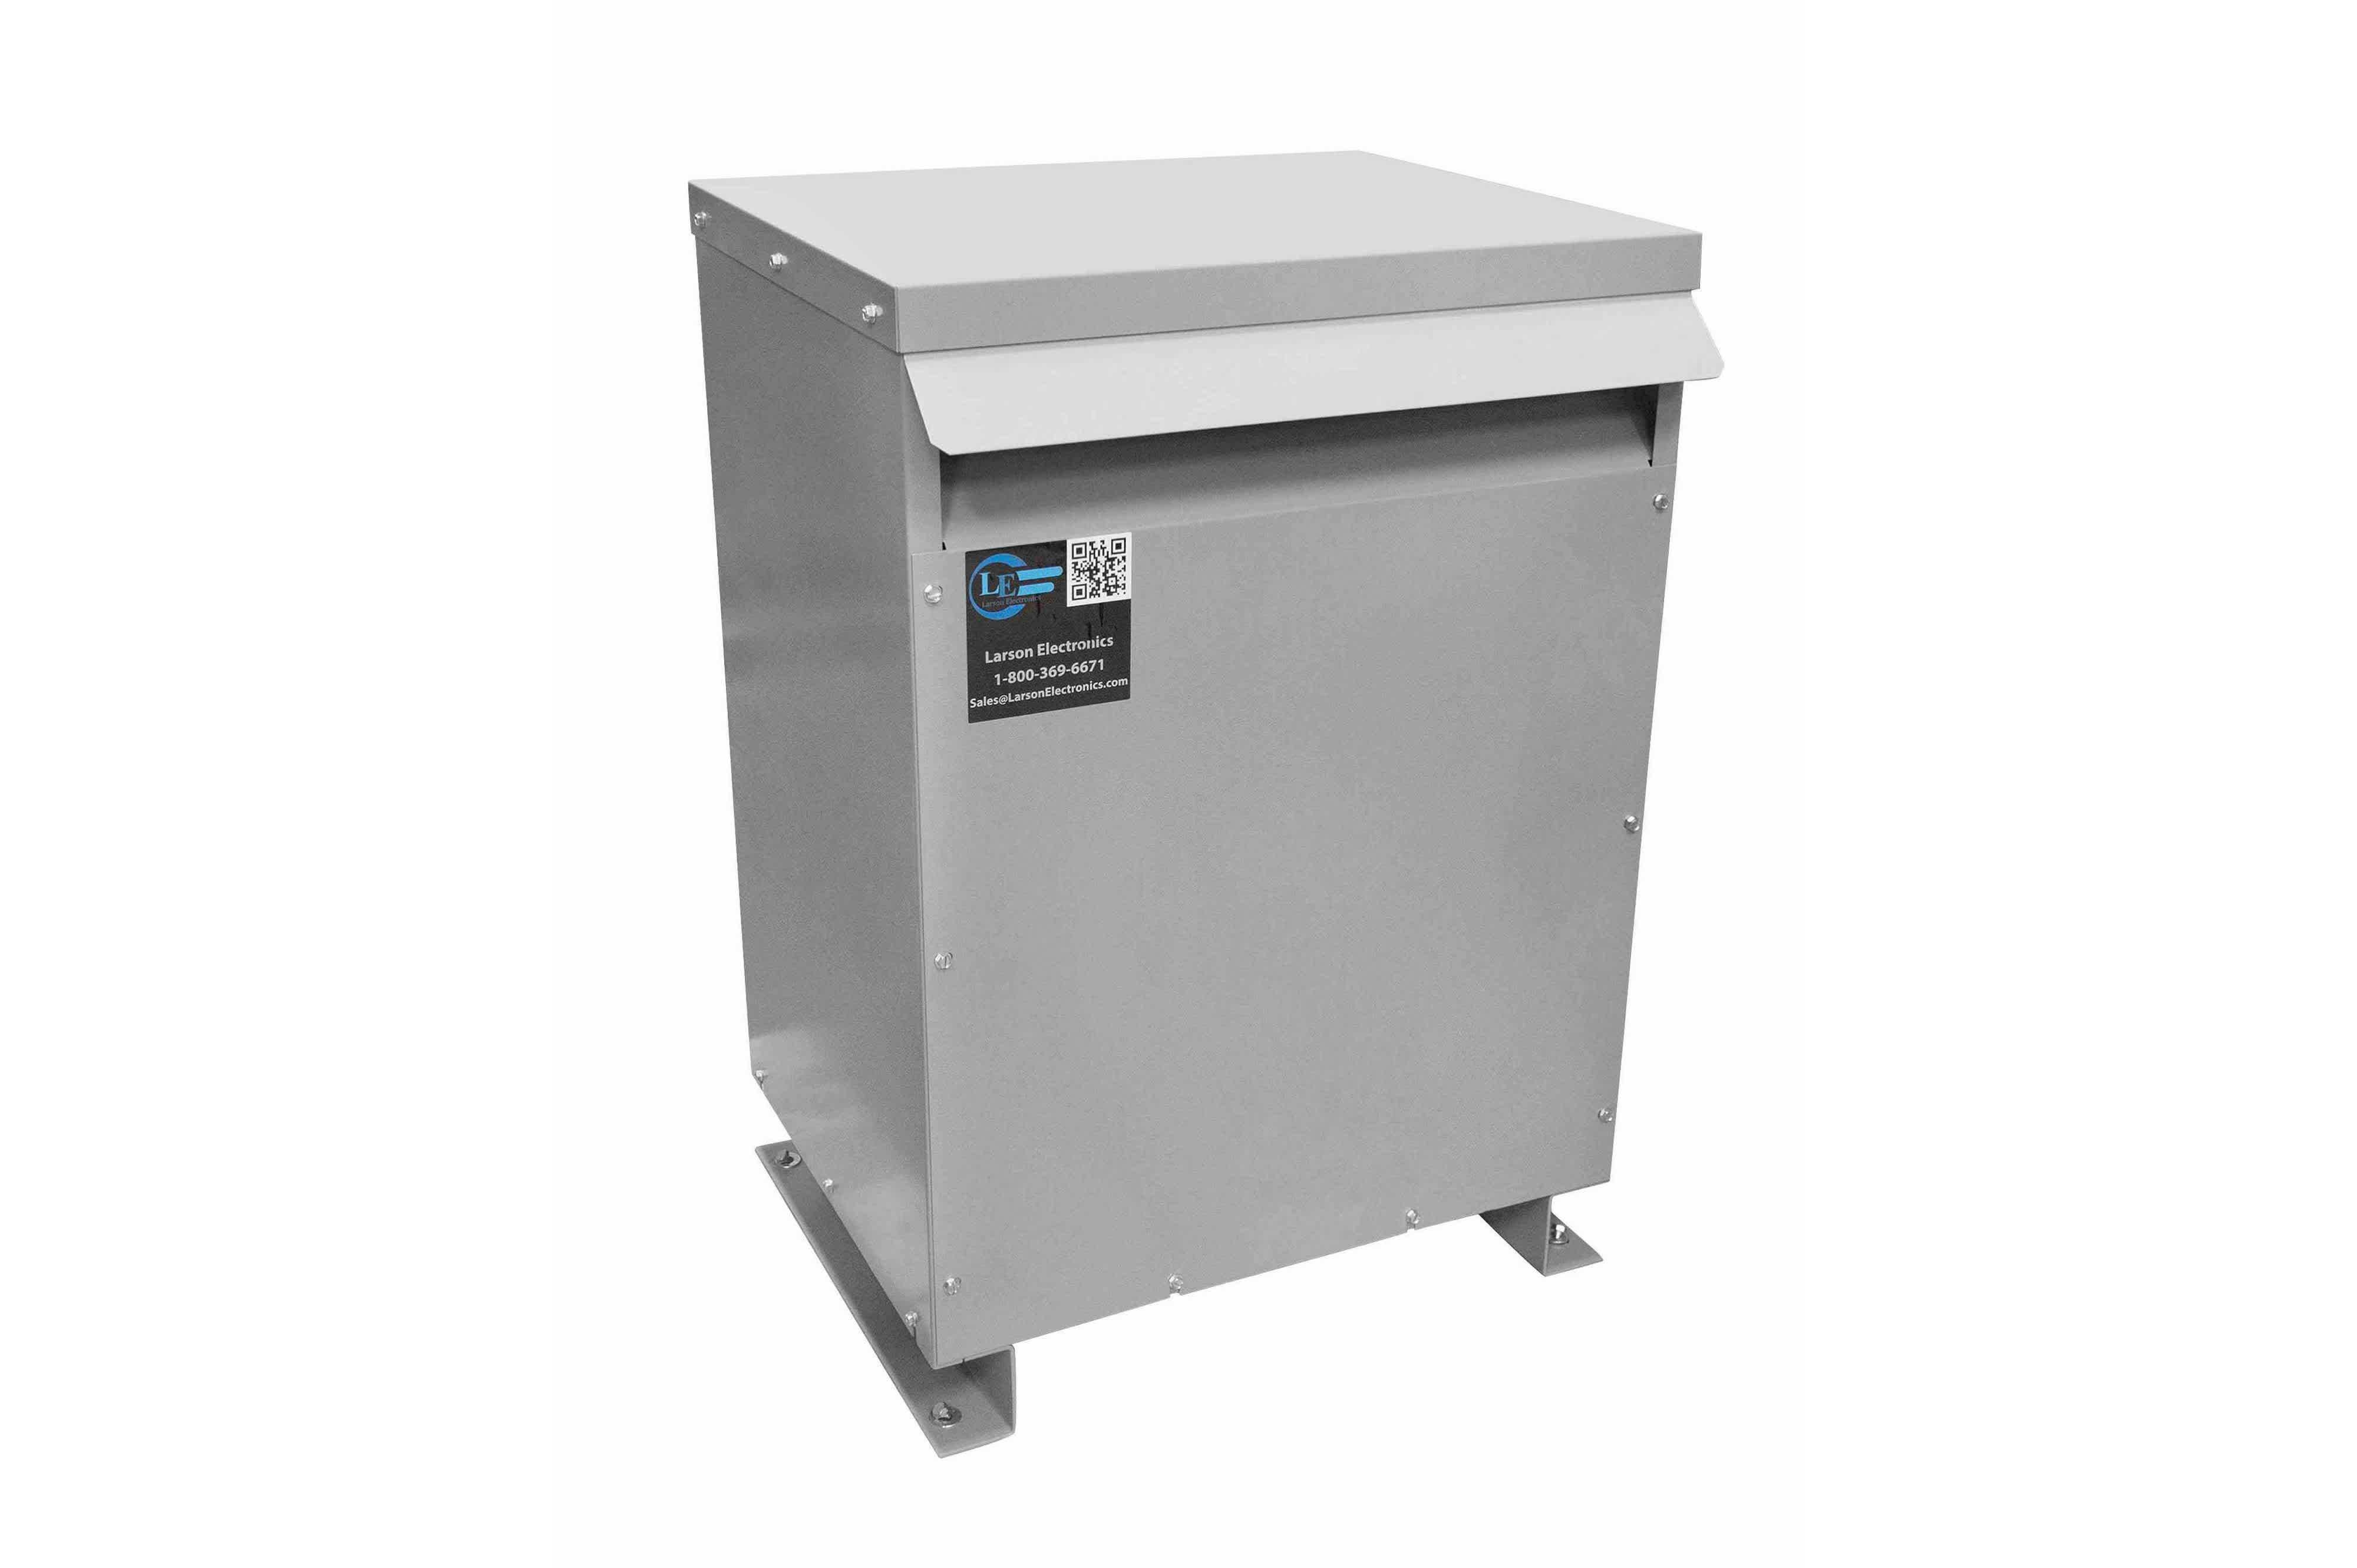 10 kVA 3PH Isolation Transformer, 600V Wye Primary, 208V Delta Secondary, N3R, Ventilated, 60 Hz